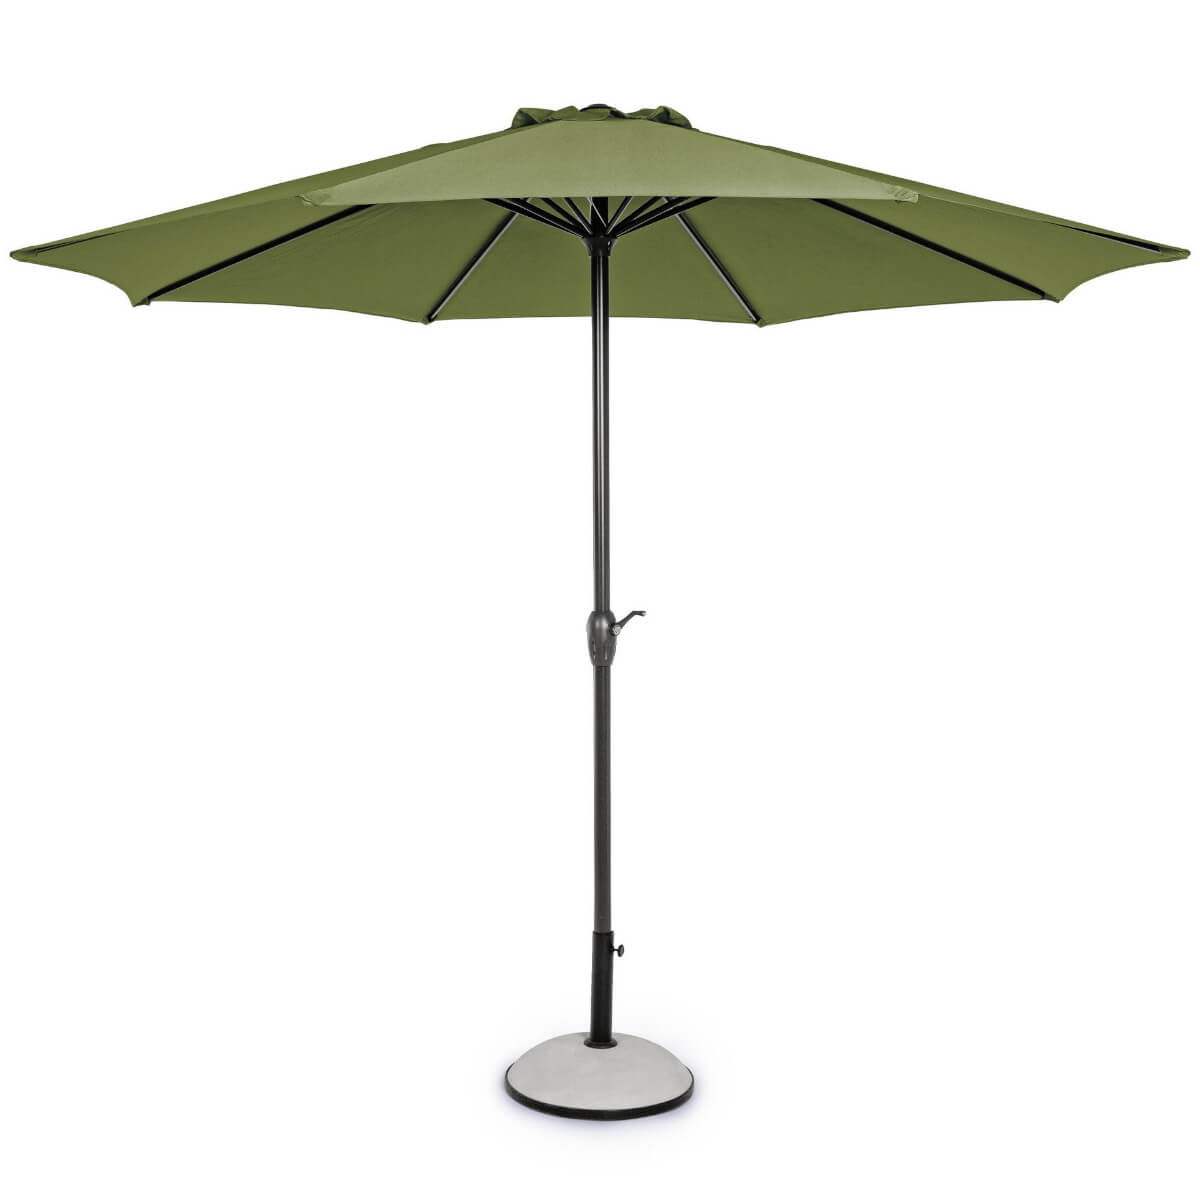 Зонт 4villa Салерно 300 см оливковый